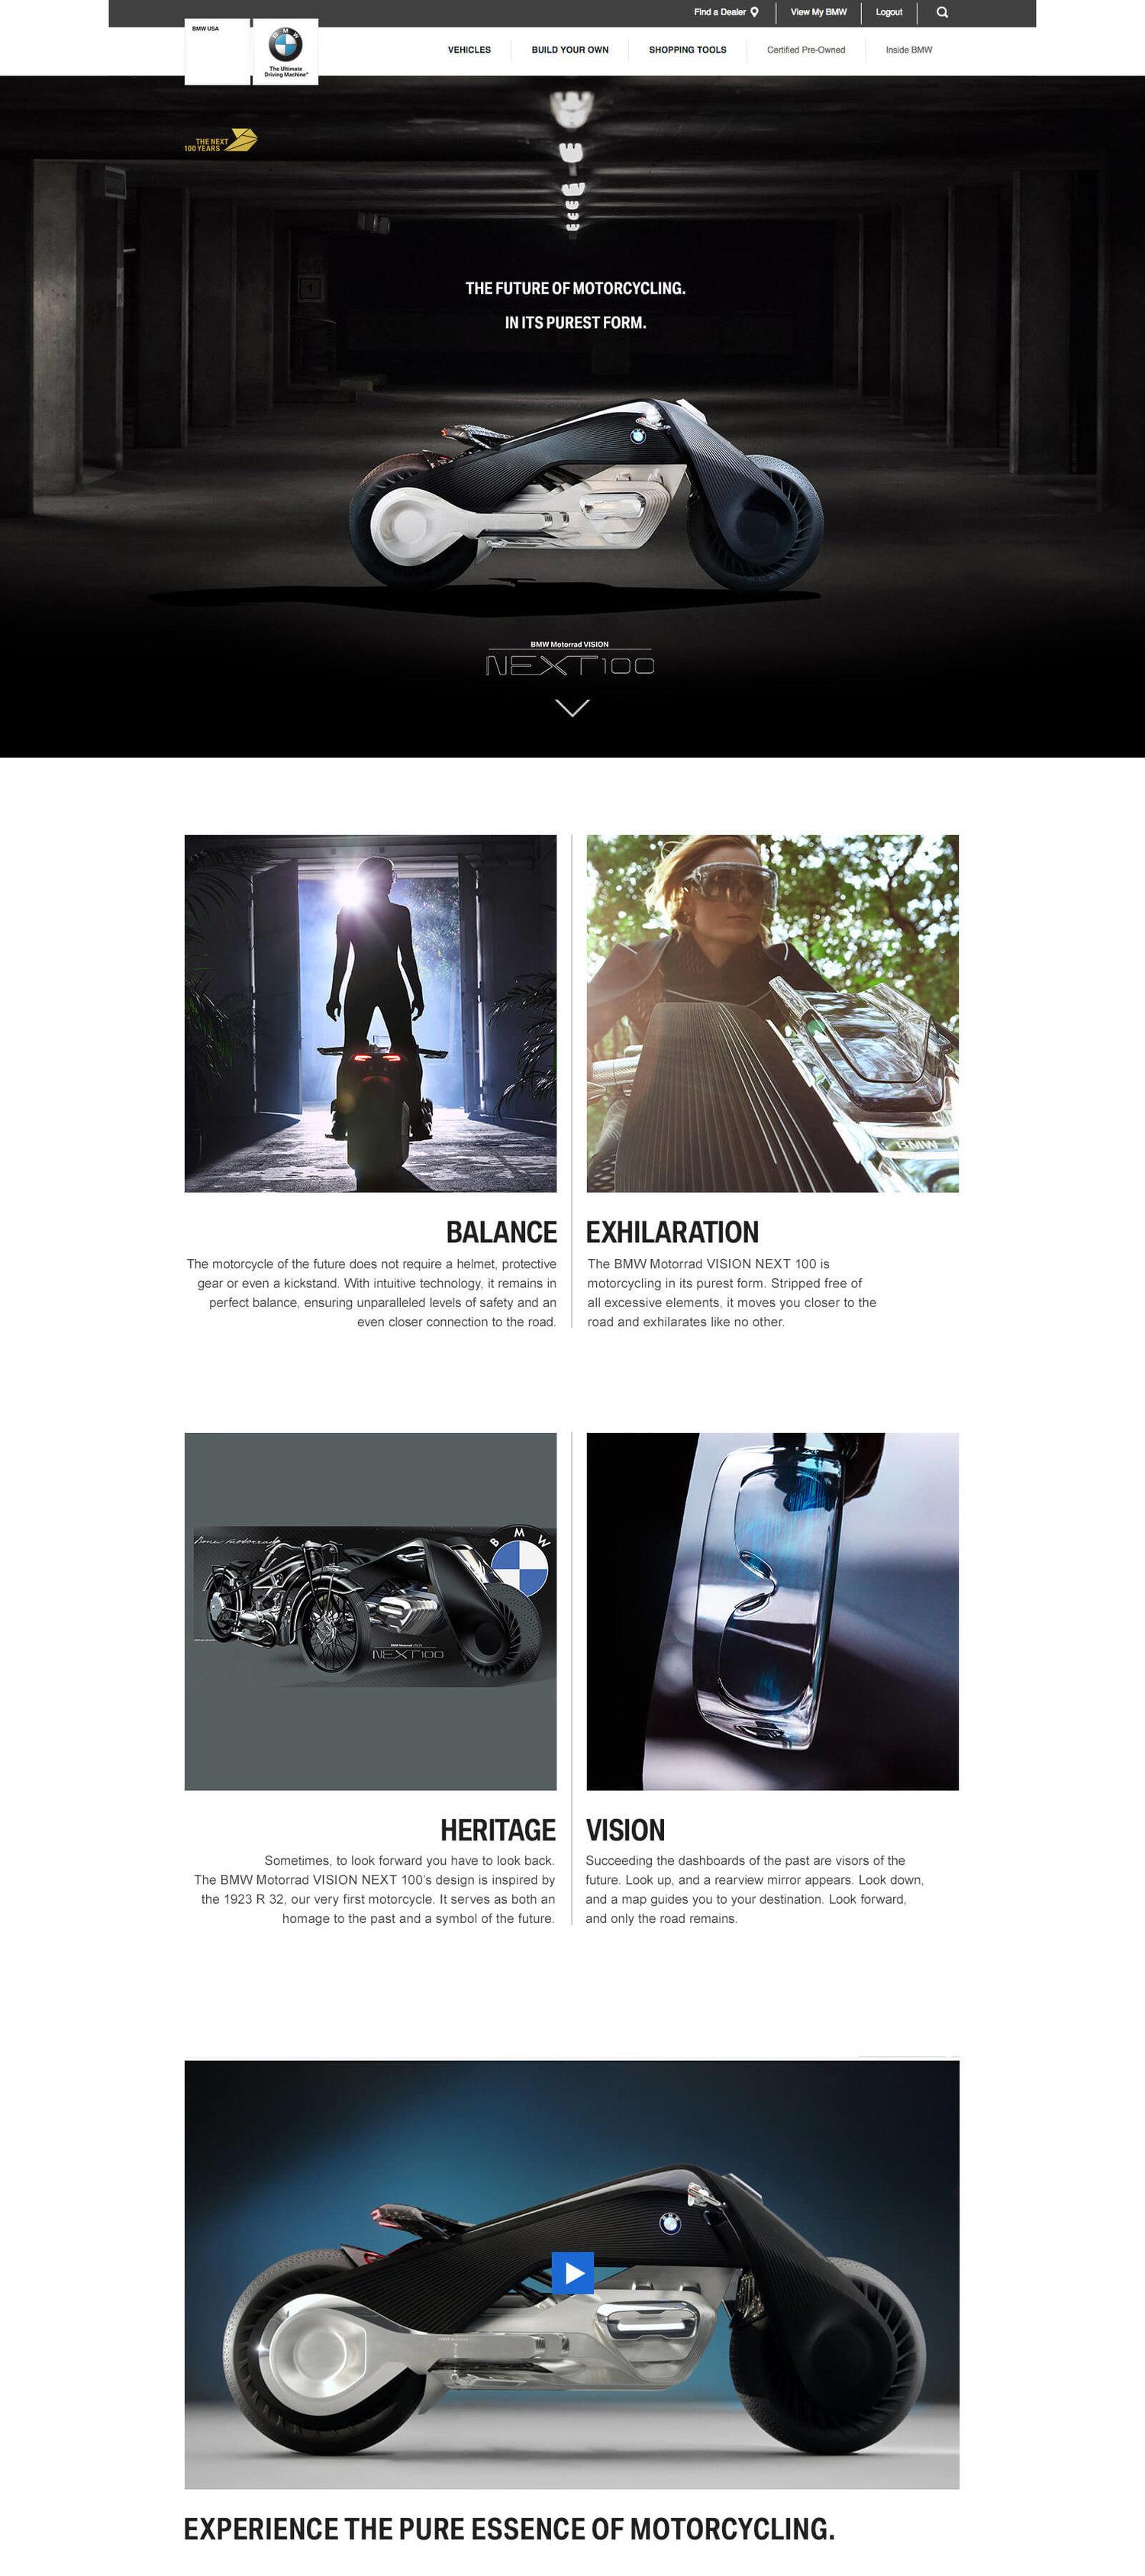 BMW_Next_100_Post_Launch_Site_Web-1.jpg